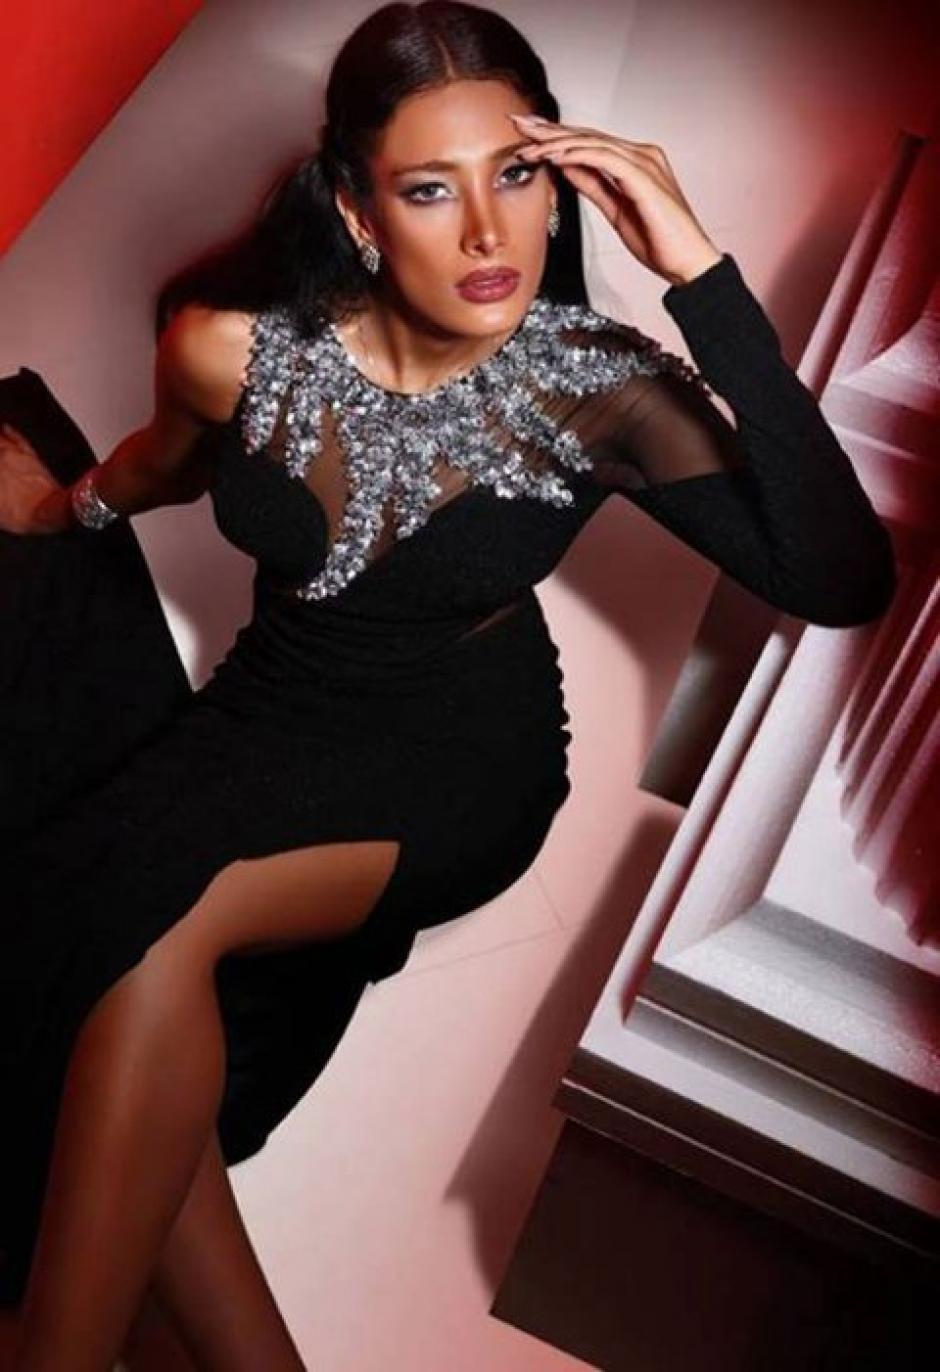 Dana Nik, otra de las modelos exiliadas de Irán. (Foto: Infobae)